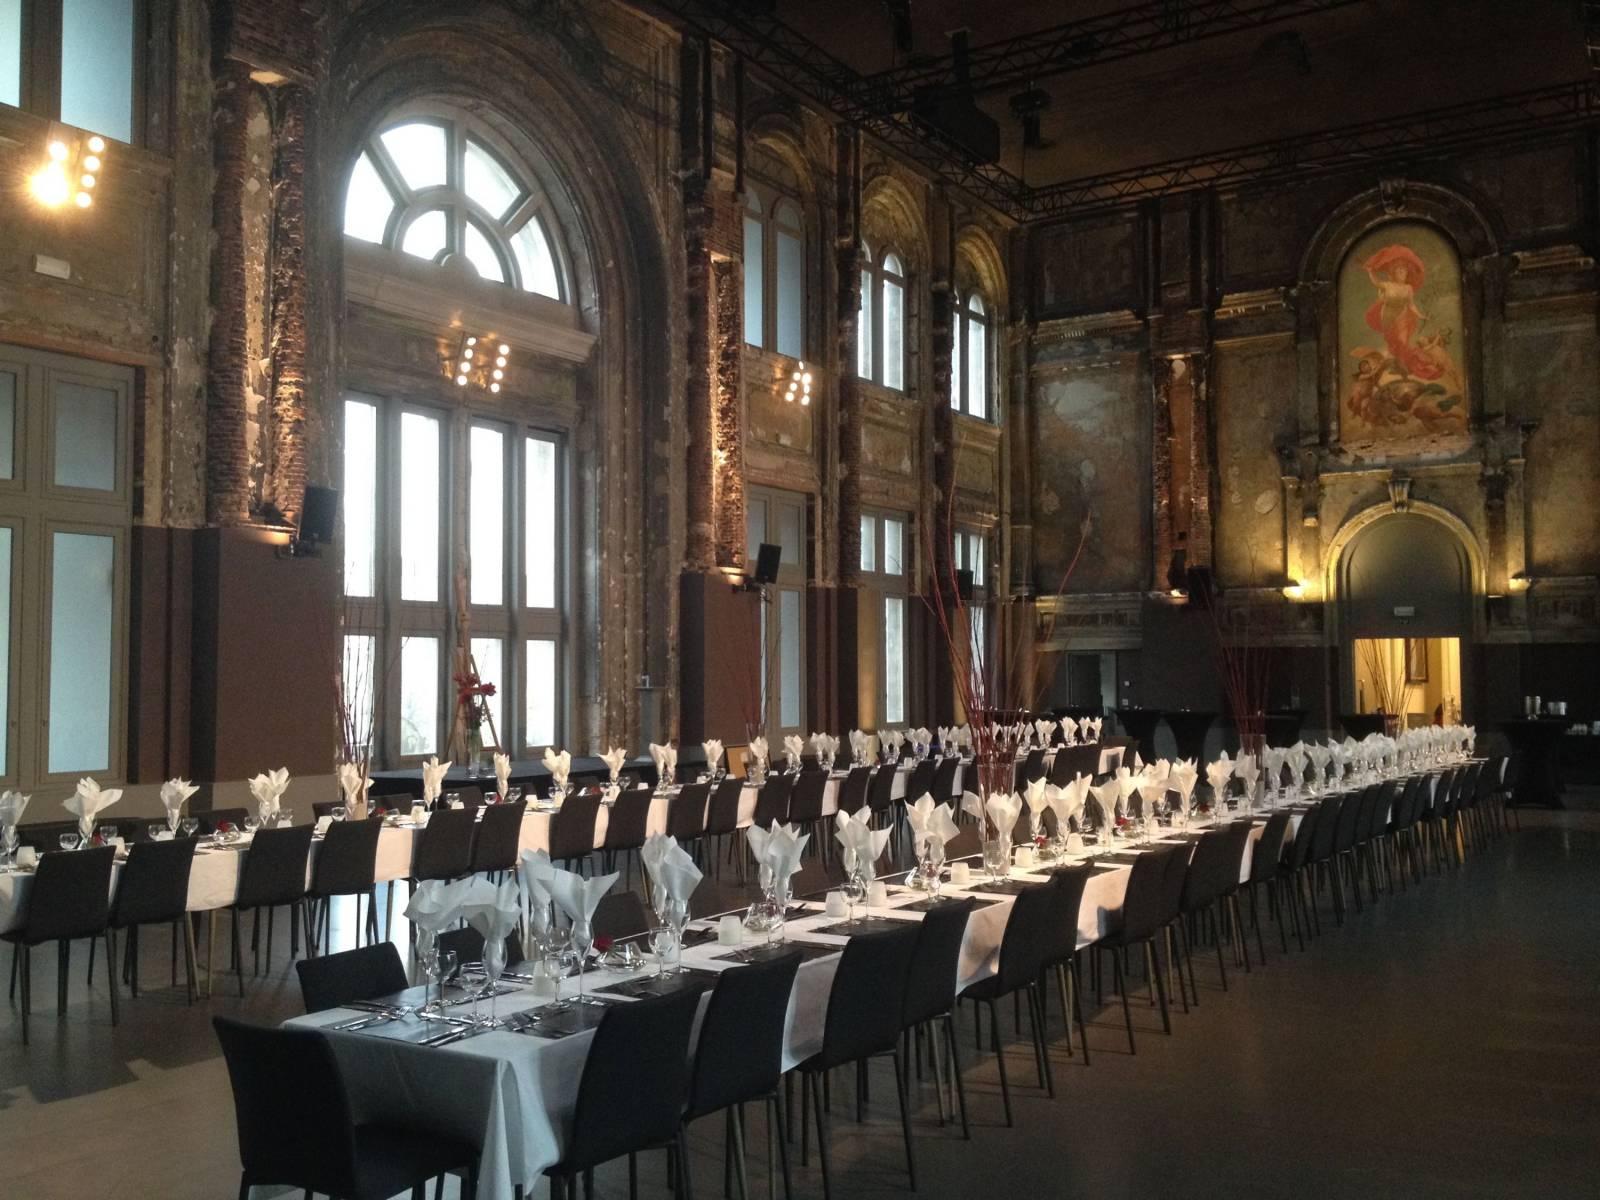 Zaal AthenA - Feestzaal - Trouwzaal - Antwerpen - House of Weddings - 11